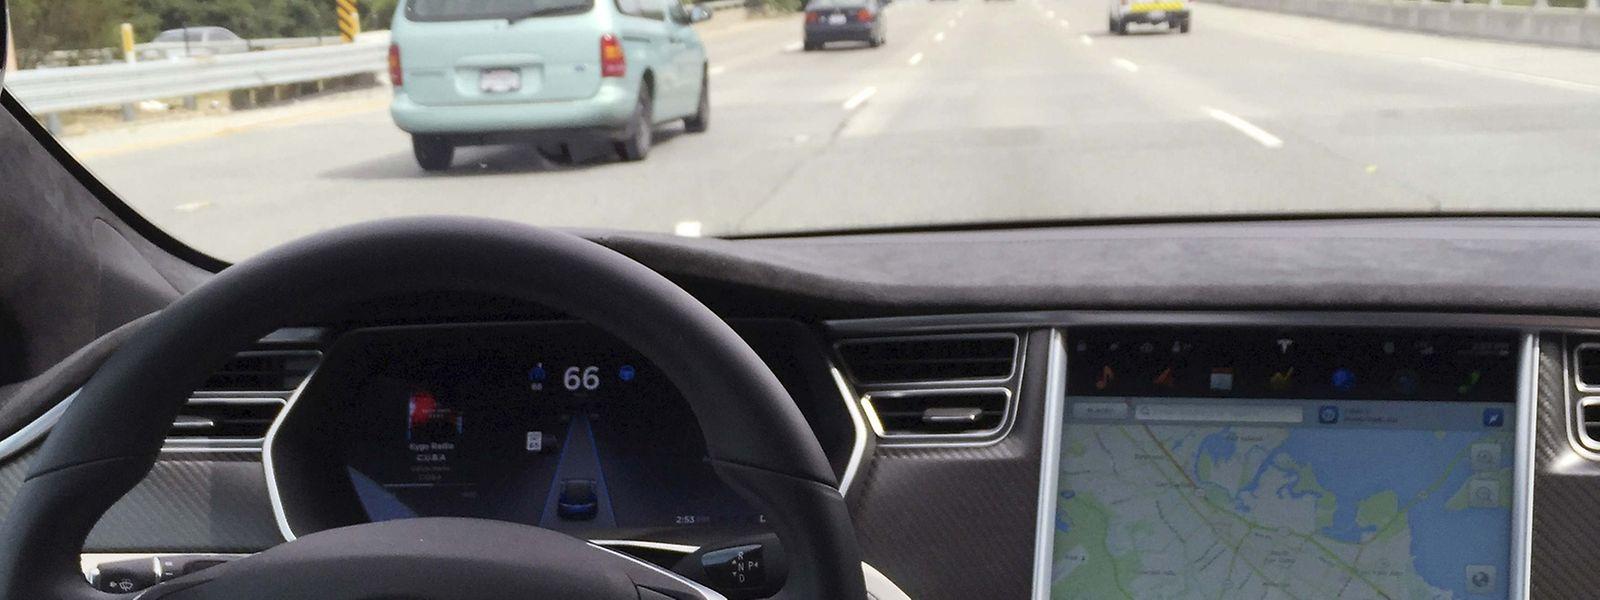 "Anfang Mai ist ein Tesla-Fahrer tödlich verunglückt - er hatte den ""Autopiloten"" eingeschaltet."